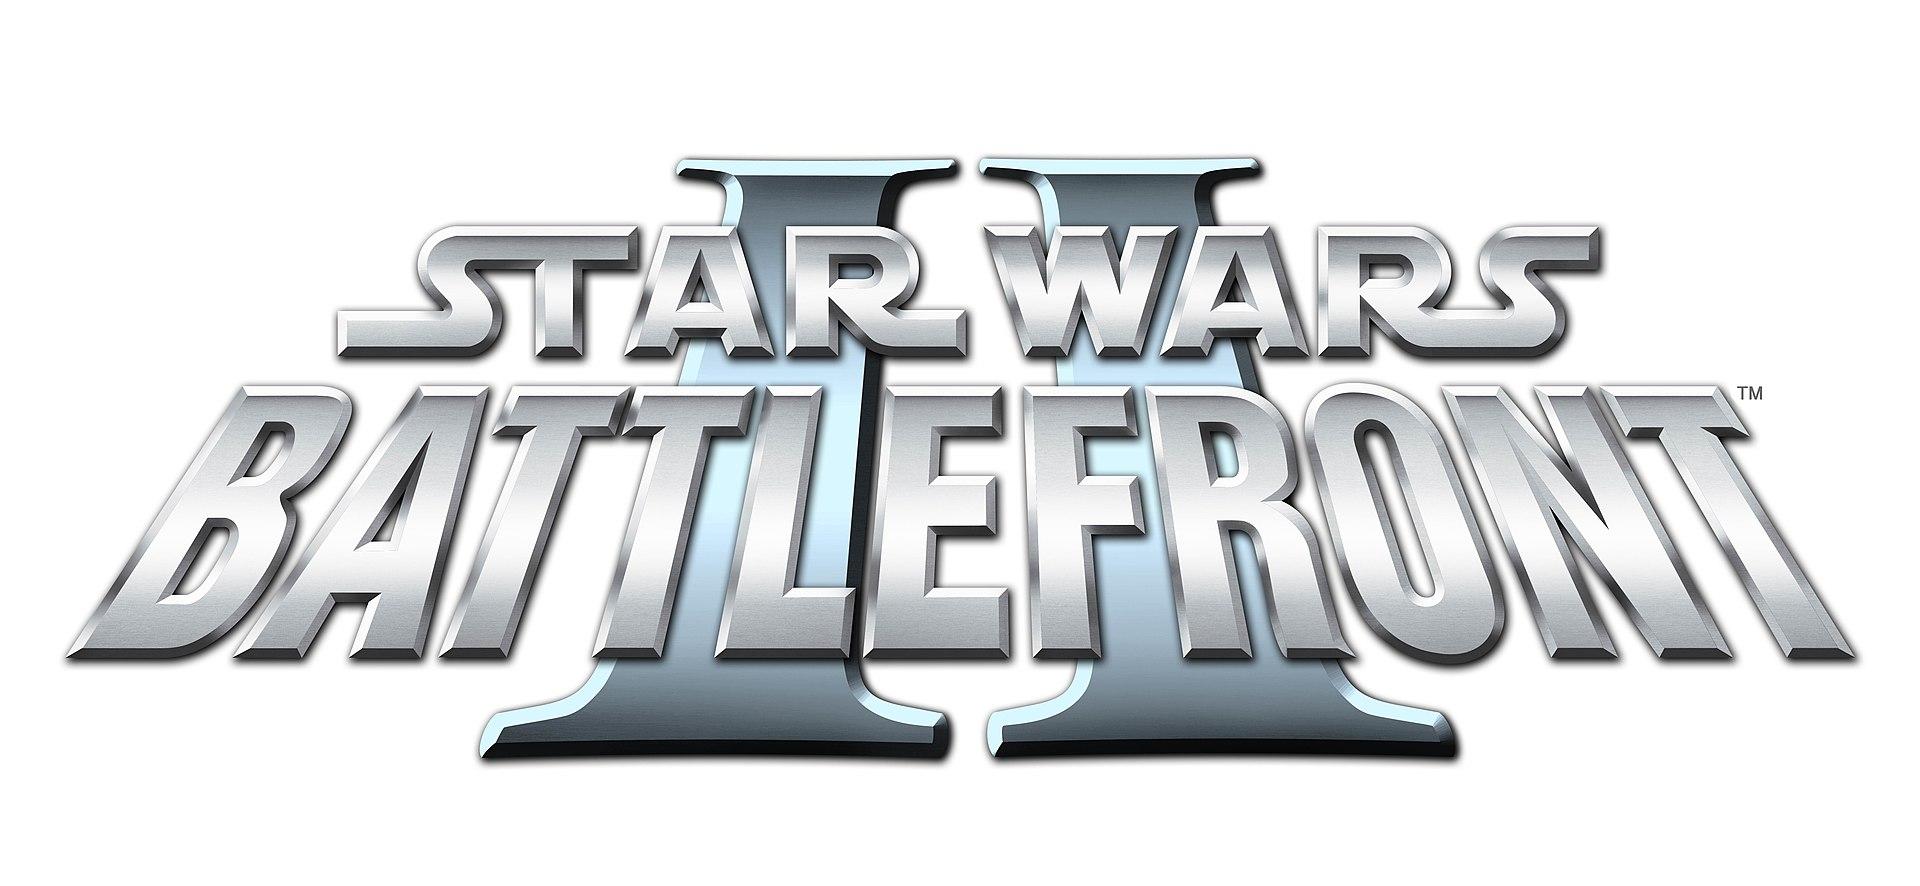 classic star wars logo